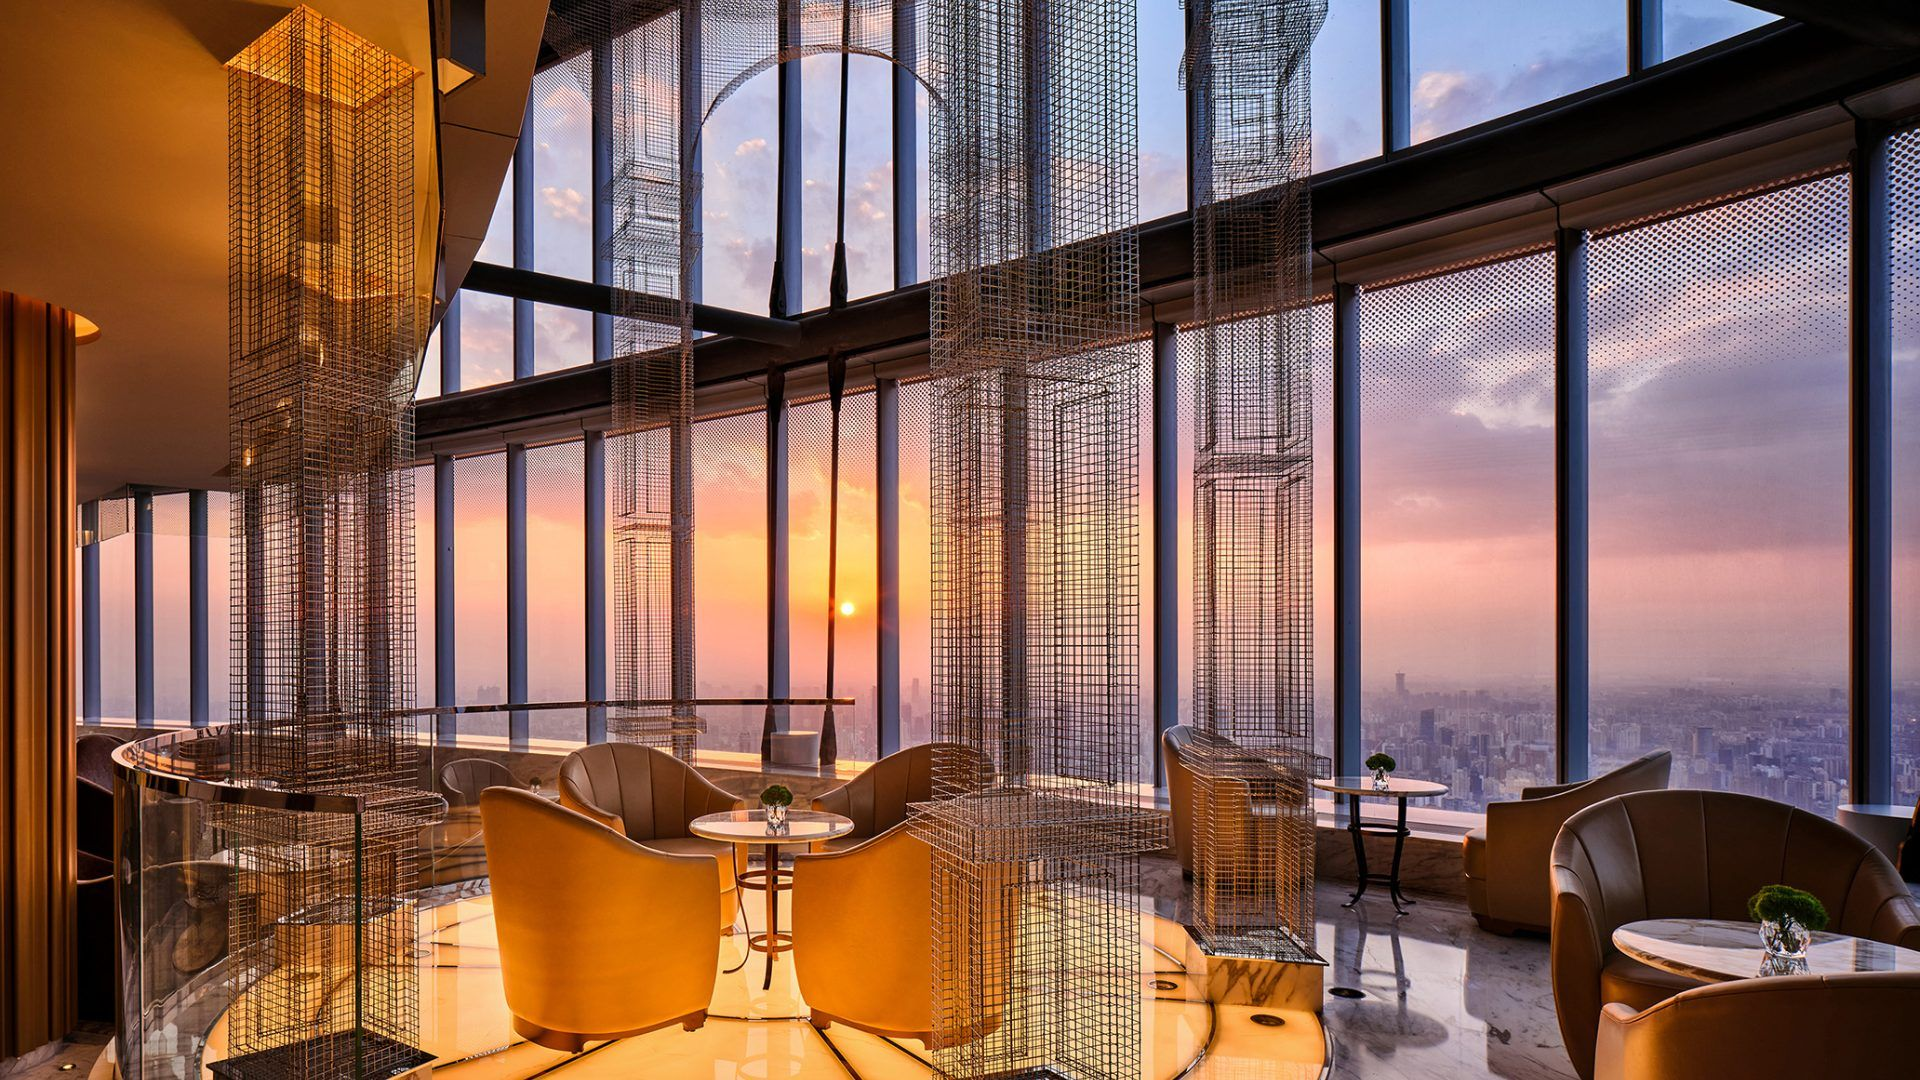 This restaurant has skyline views of Shanghai at the J Hotel